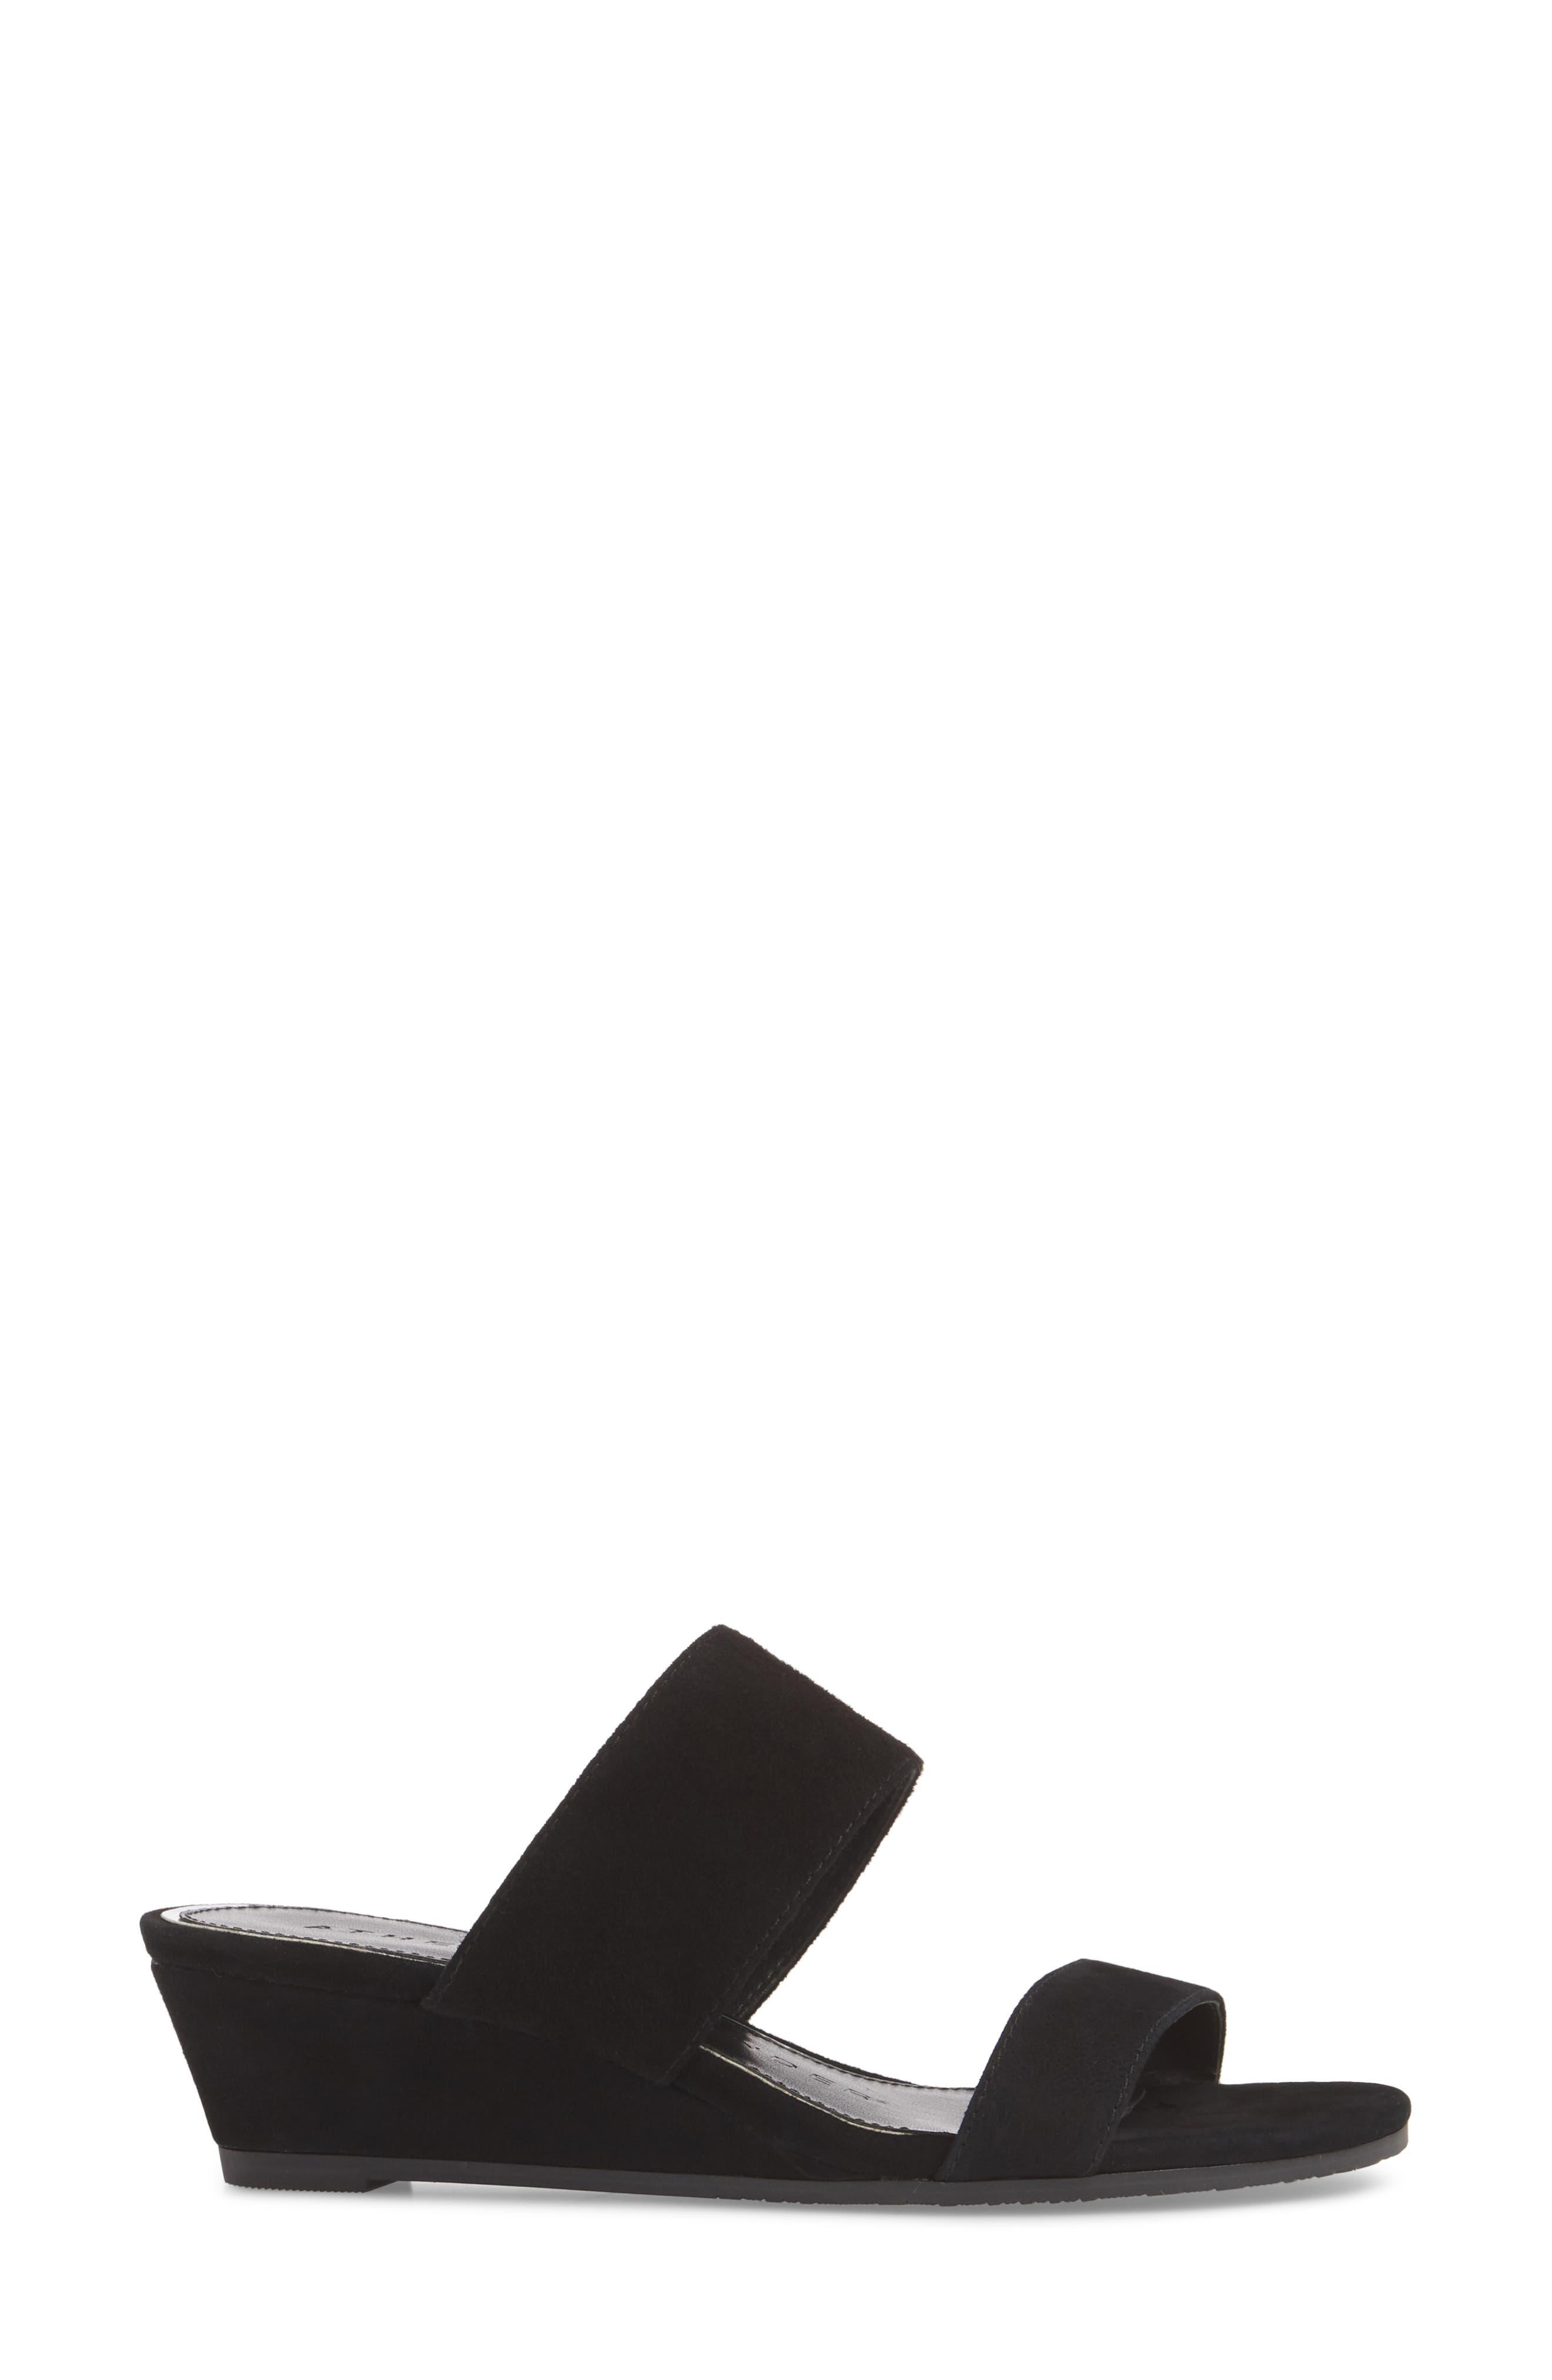 Burlington Wedge Slide Sandal,                             Alternate thumbnail 3, color,                             BLACK SUEDE